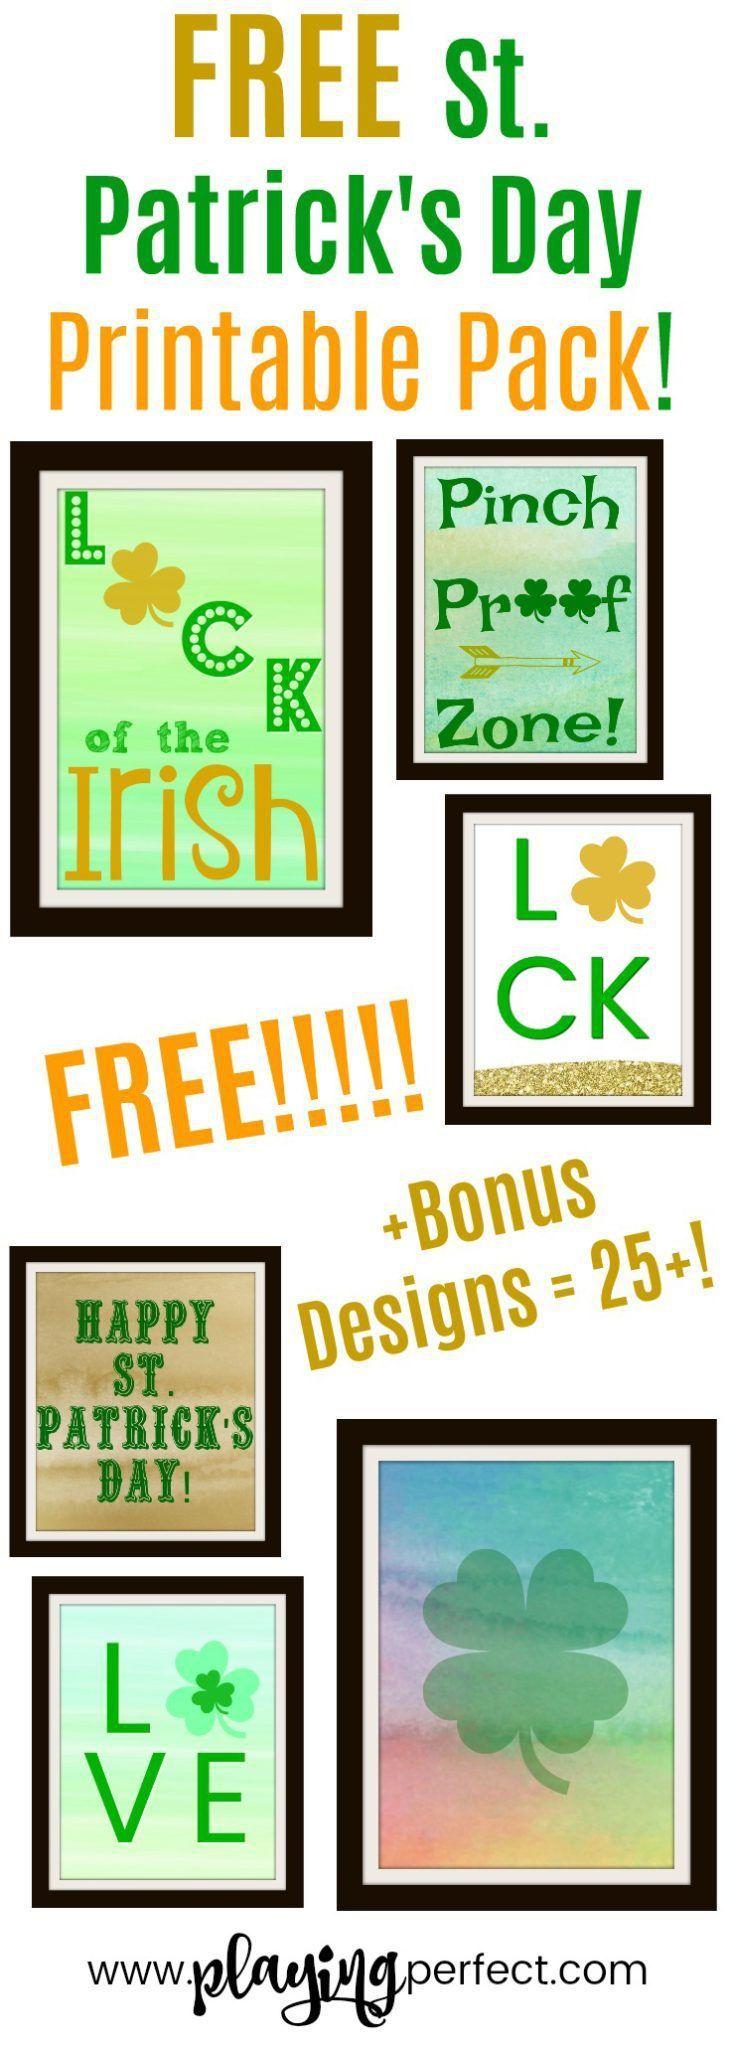 Happy St. Patrick's Day! Here are tons of great St. Patrick's Day free printables! More than 25 St. Patrick's Day printables and also check out the list of St. Patrick's Day shirts too! Grab your FREE St. Patrick's Day printable pack! | playingperfect.com | #StPatricksDay #playingperfect #progressnotperfection #wallart #stpaddysday #stpattysday #irish #ireland #march #shamrocks #happystpatricksday #freeprintable #freeprintables #printables #printablepack #freewallart